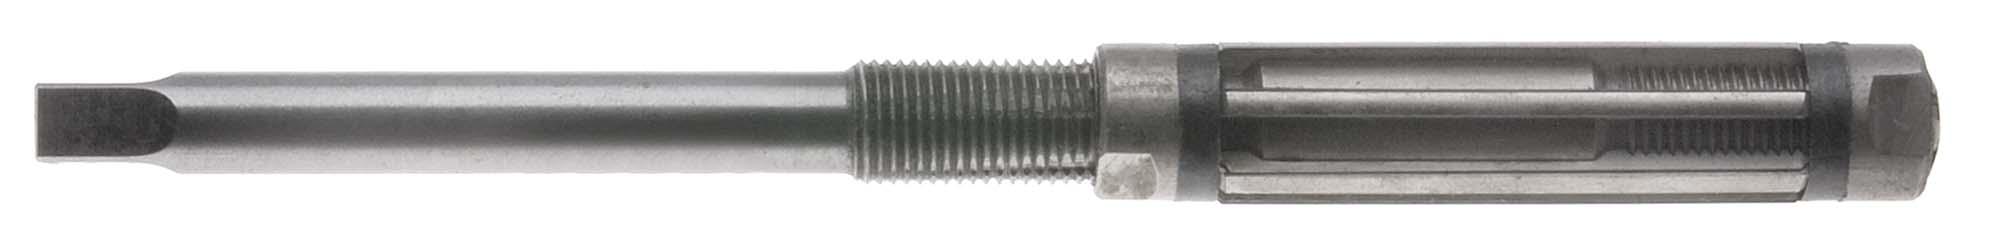 "RMBLC-3A Carbon Steel Adjustable Blade Reamer, 13/32""-7/16"""